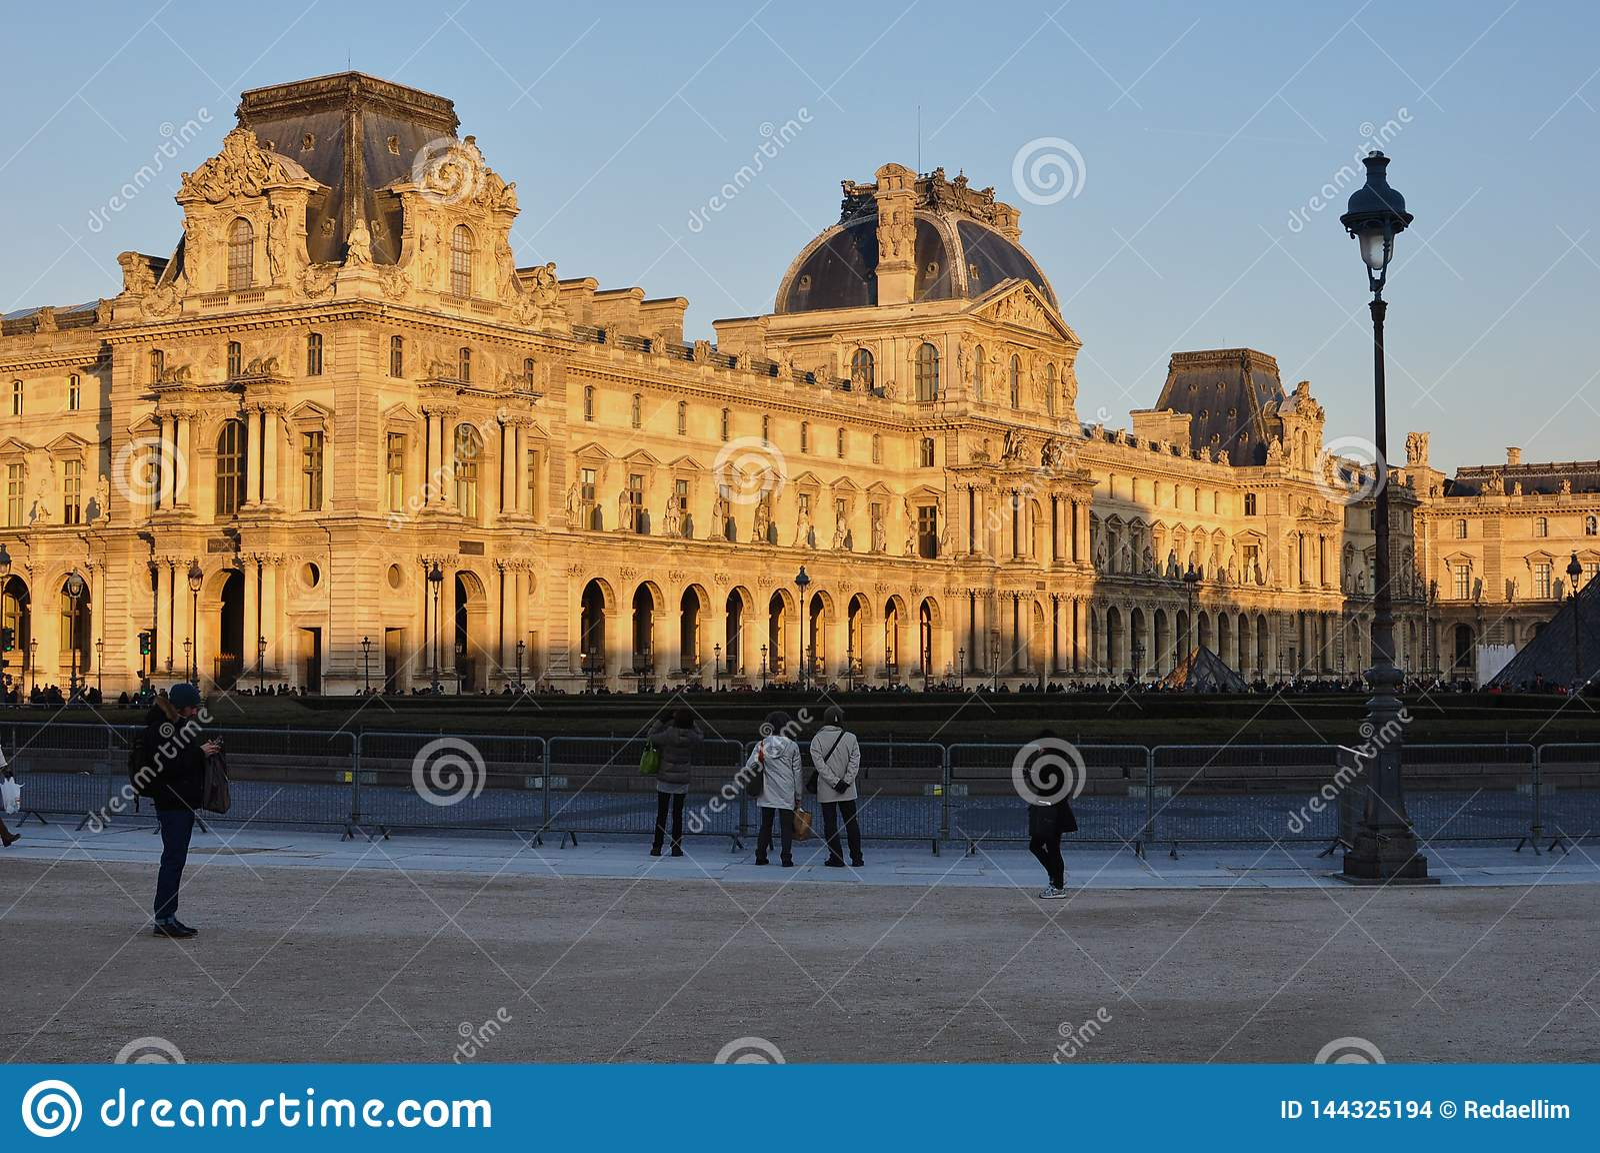 Paryż, Francja - 02/08/2015: Widok louvre muzeum